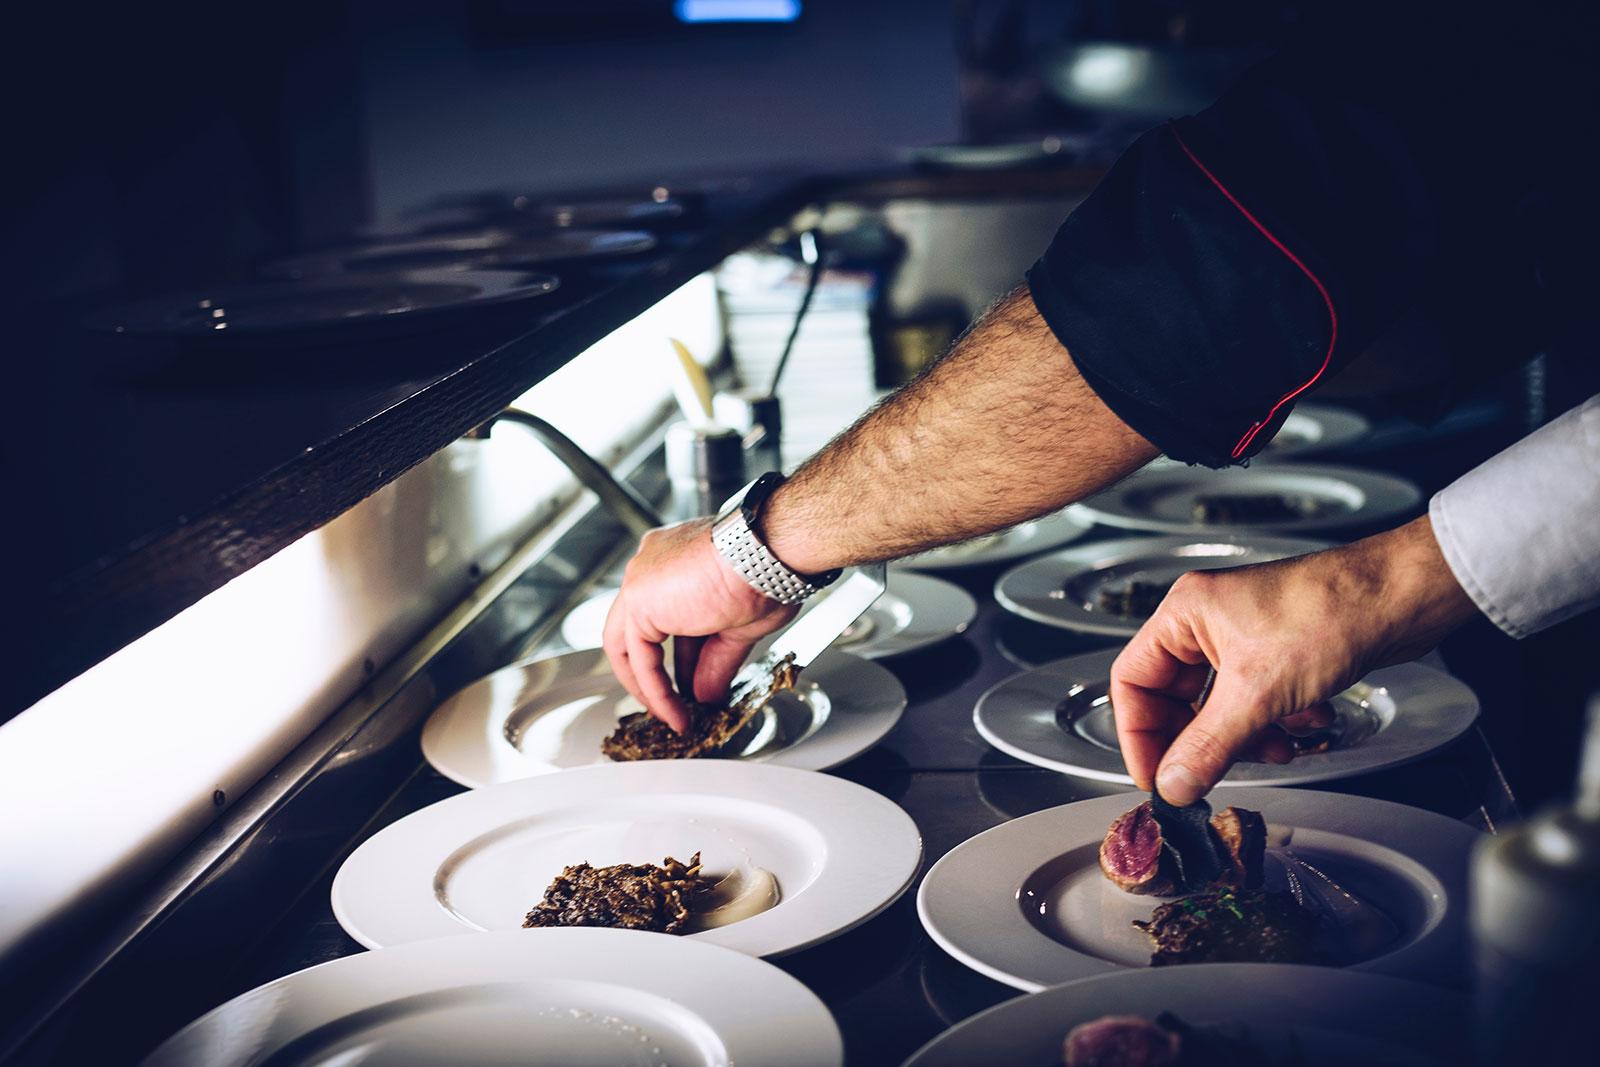 Hintergrund-Linke-Kulinar